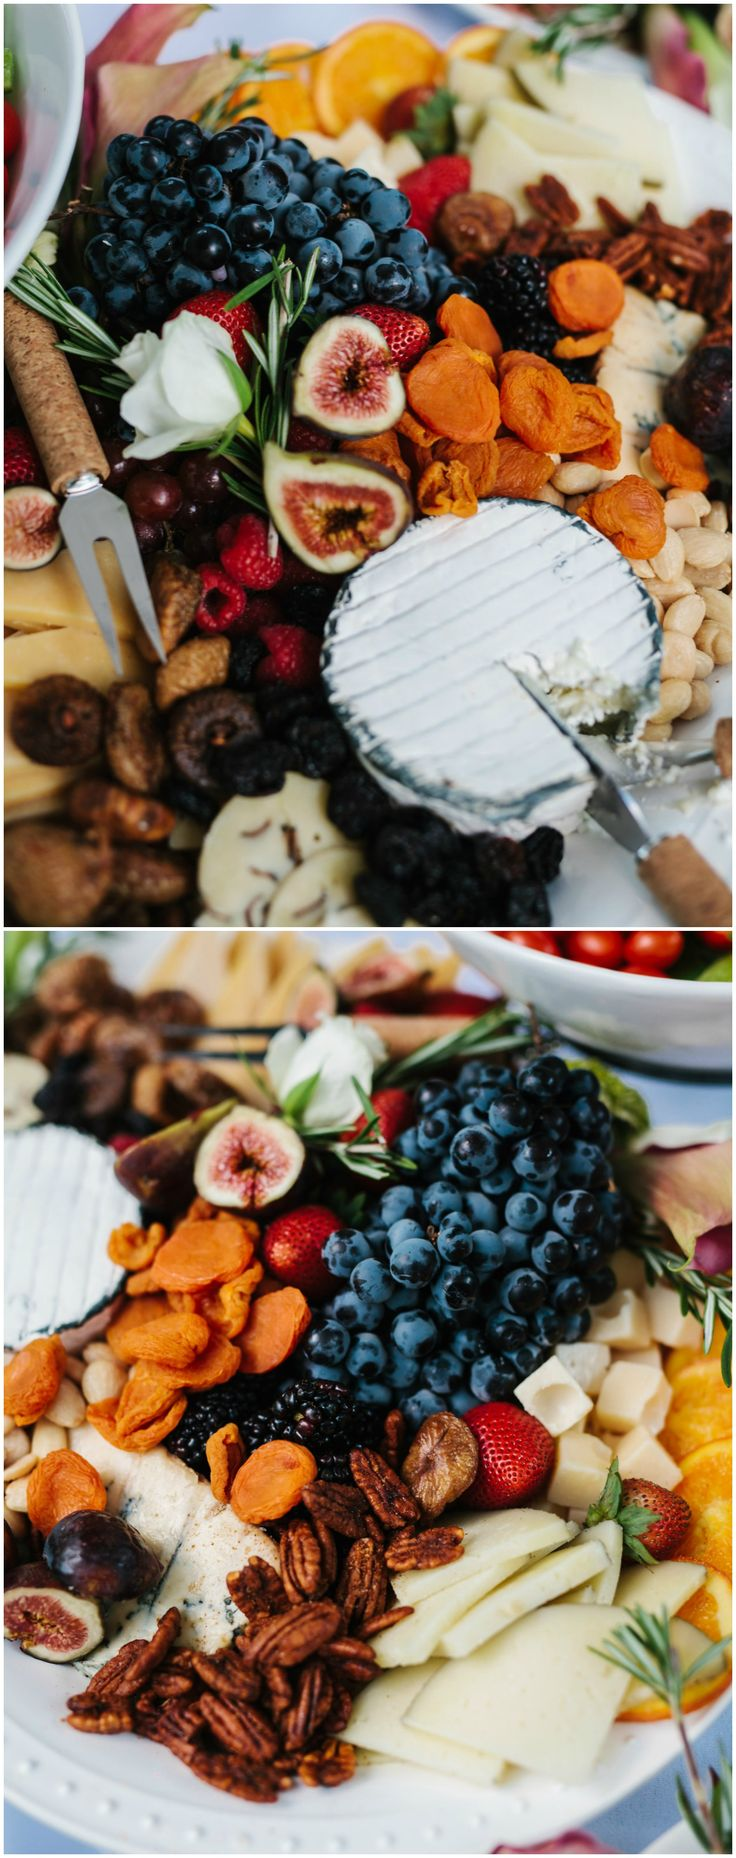 The Smarter Way To Wed Wedding Reception FoodReception IdeasWedding